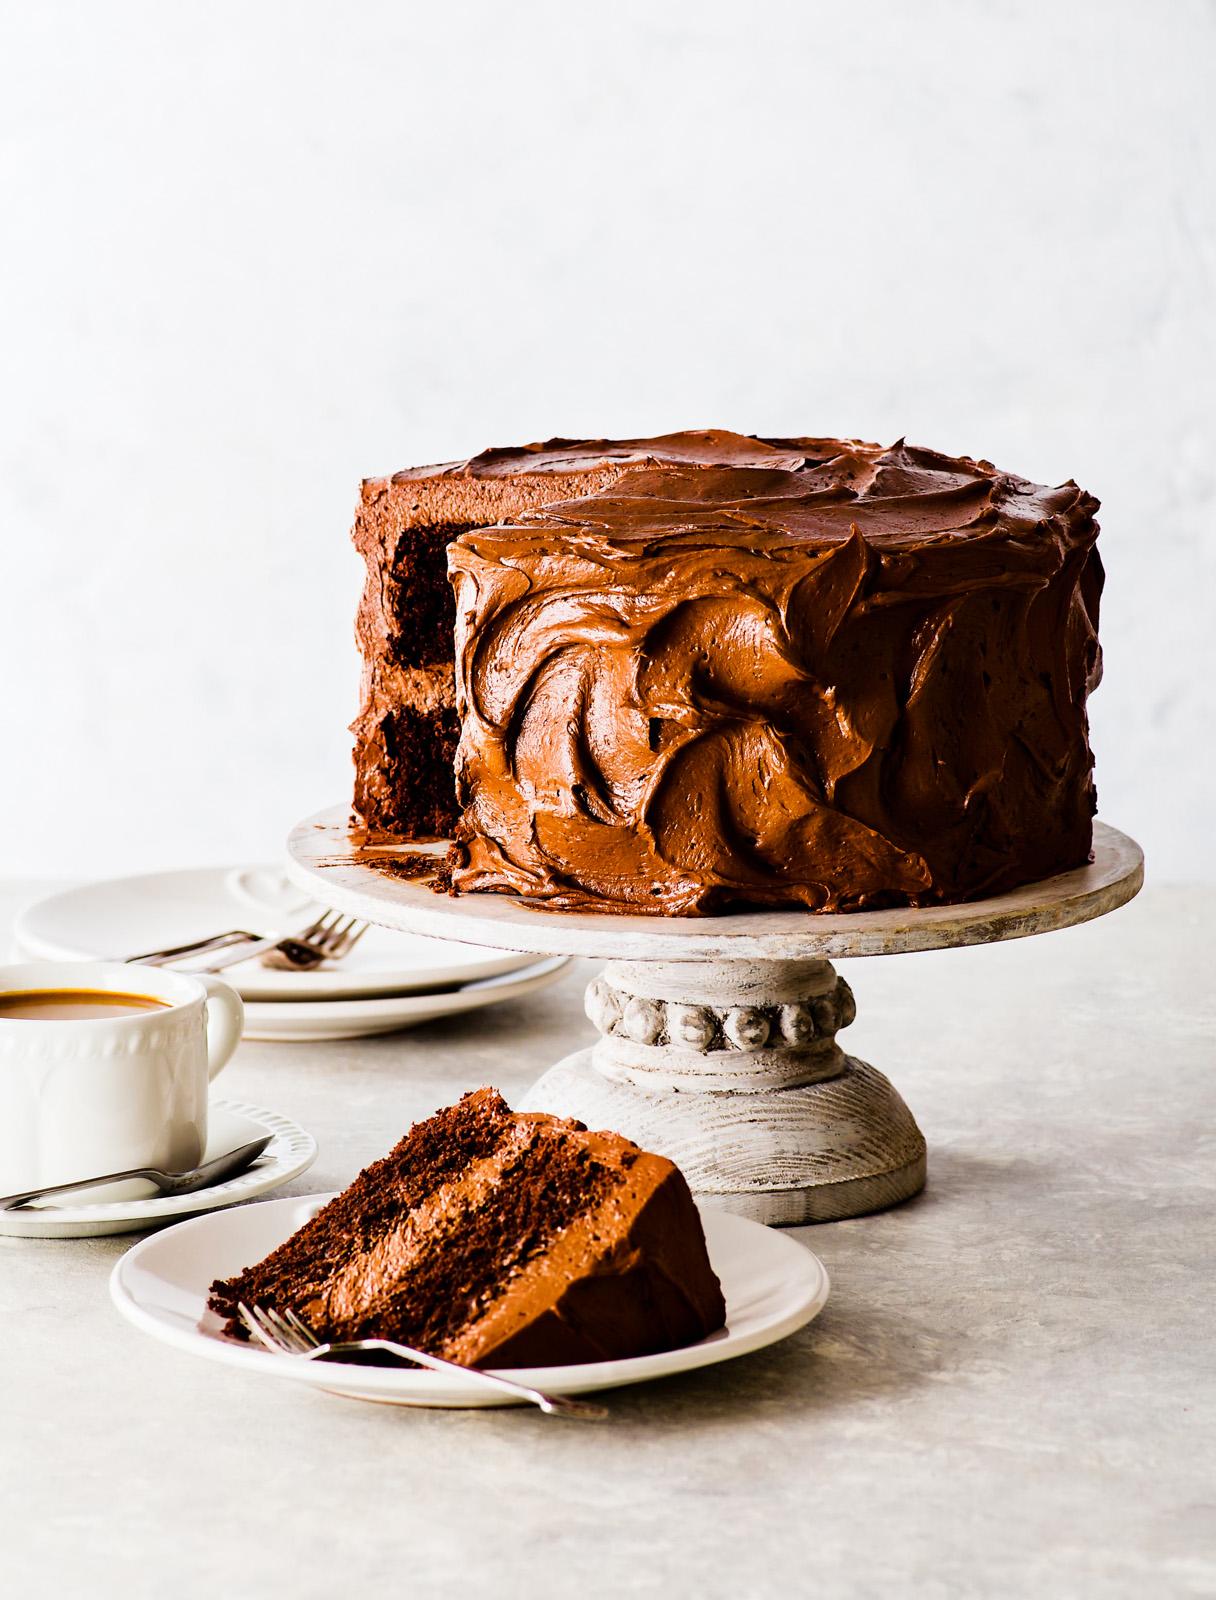 Super-Moist Gluten-Free Chocolate Cake